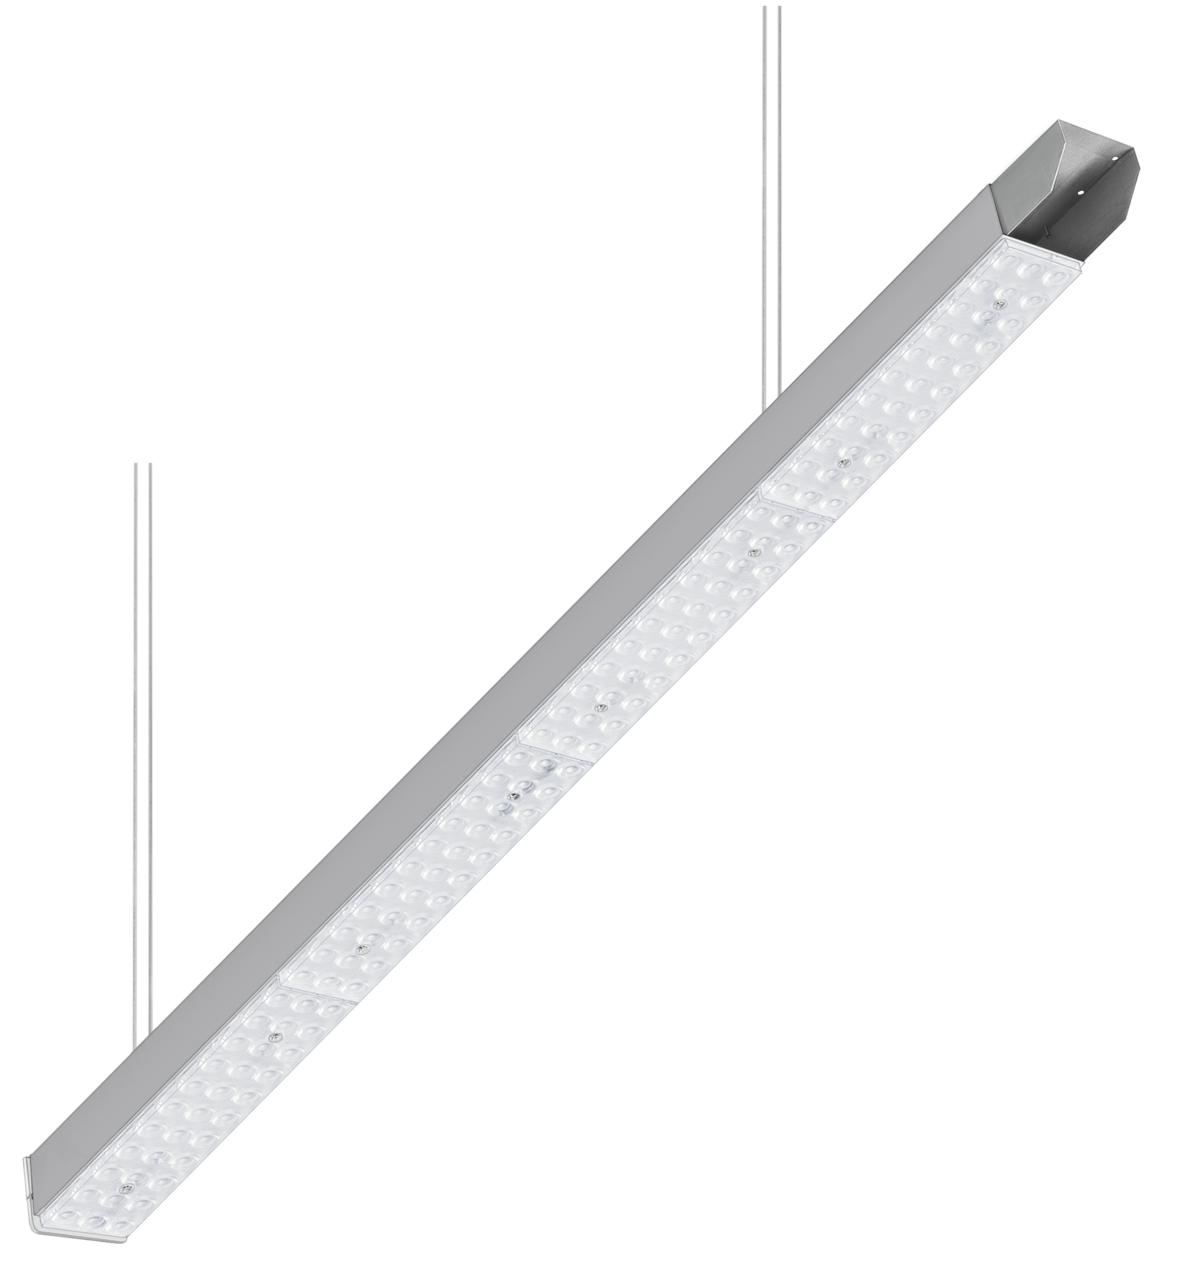 Светильник CSVT VOLGA 76Вт IP20 110° 1724x69x63мм